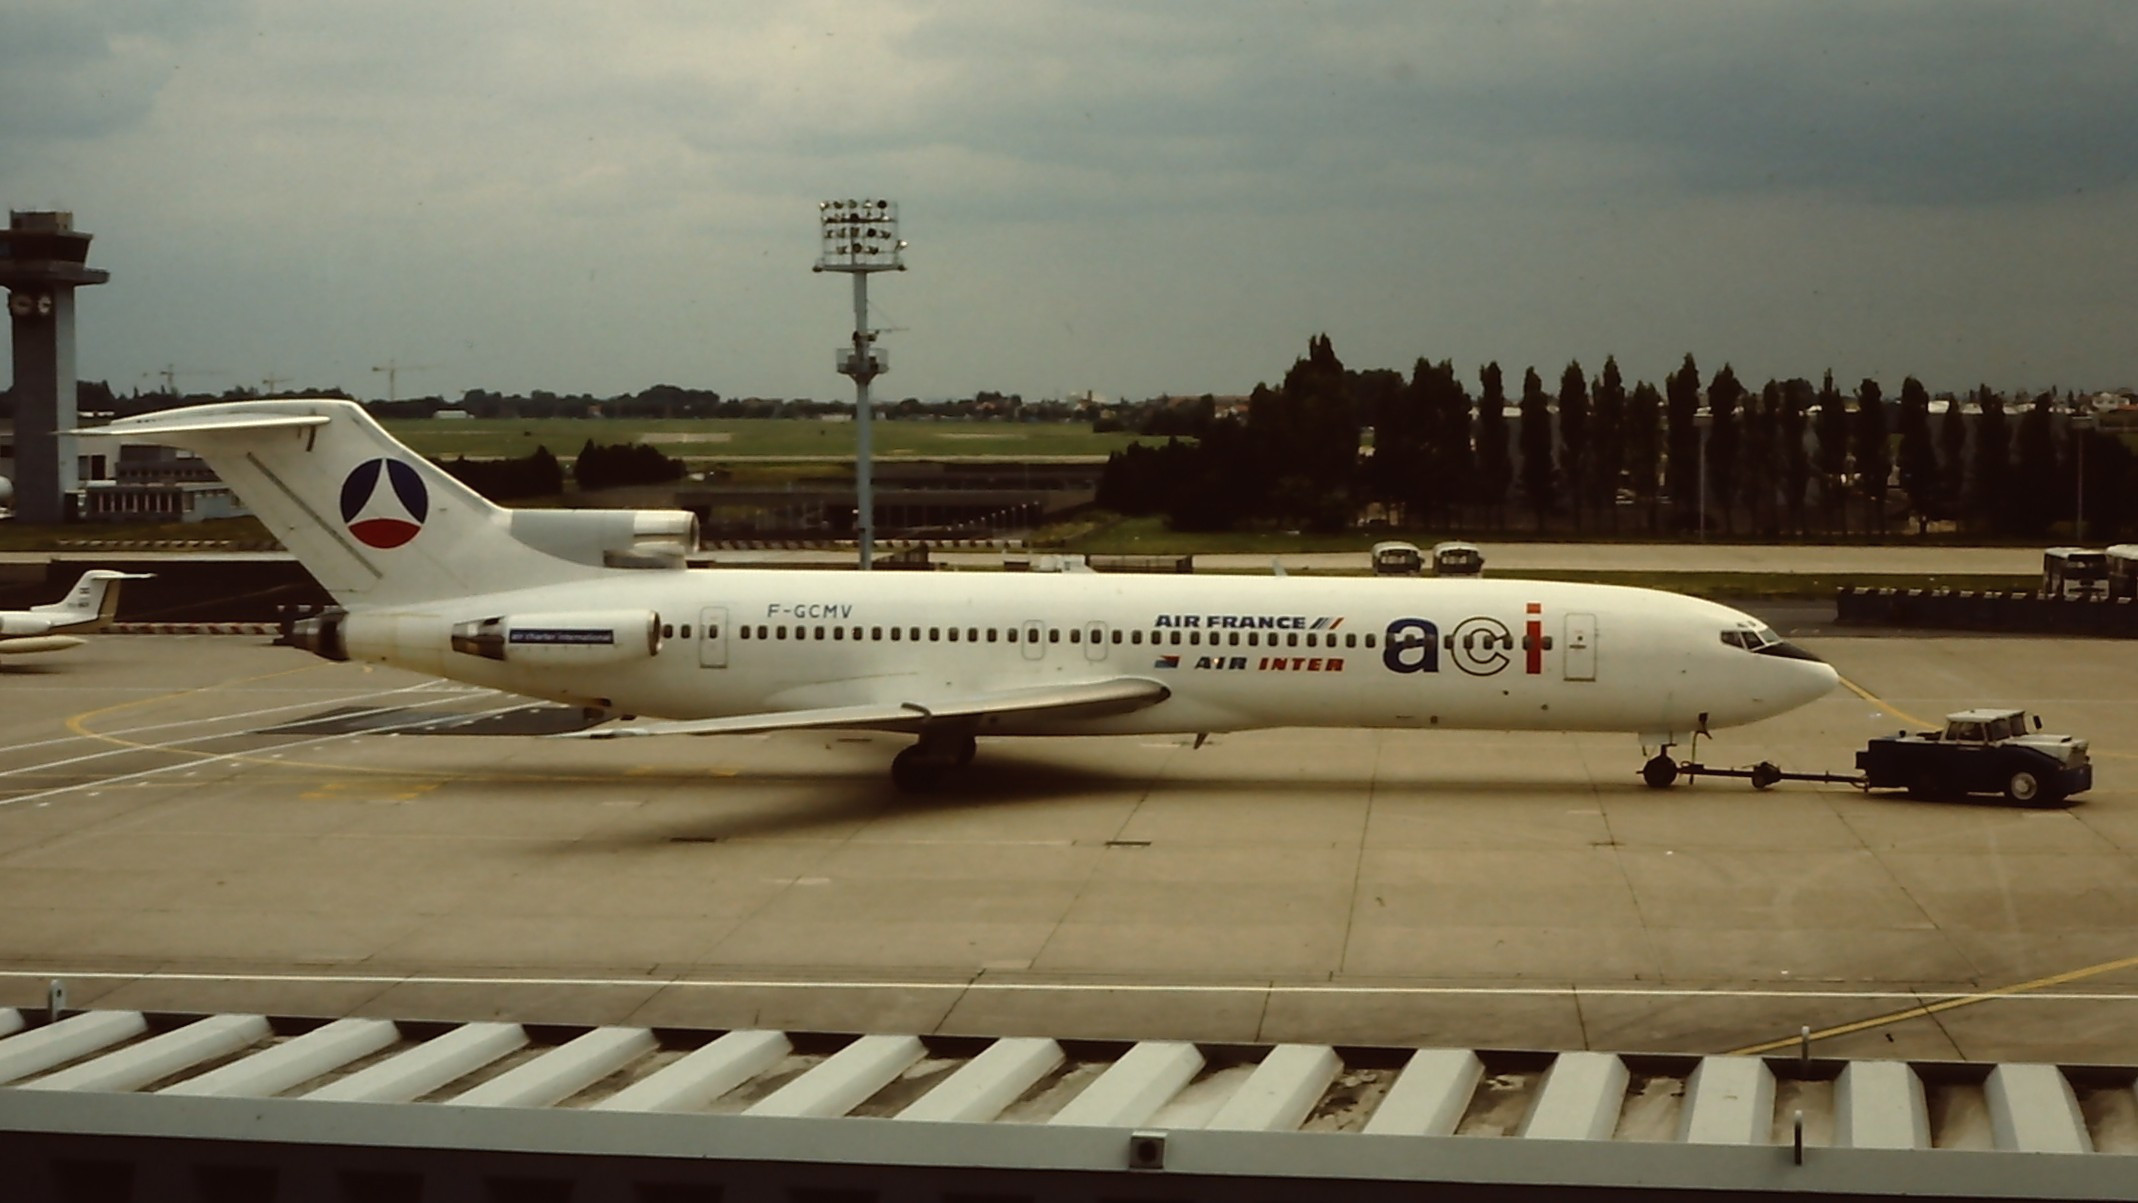 Air Charter International - Wikipedia